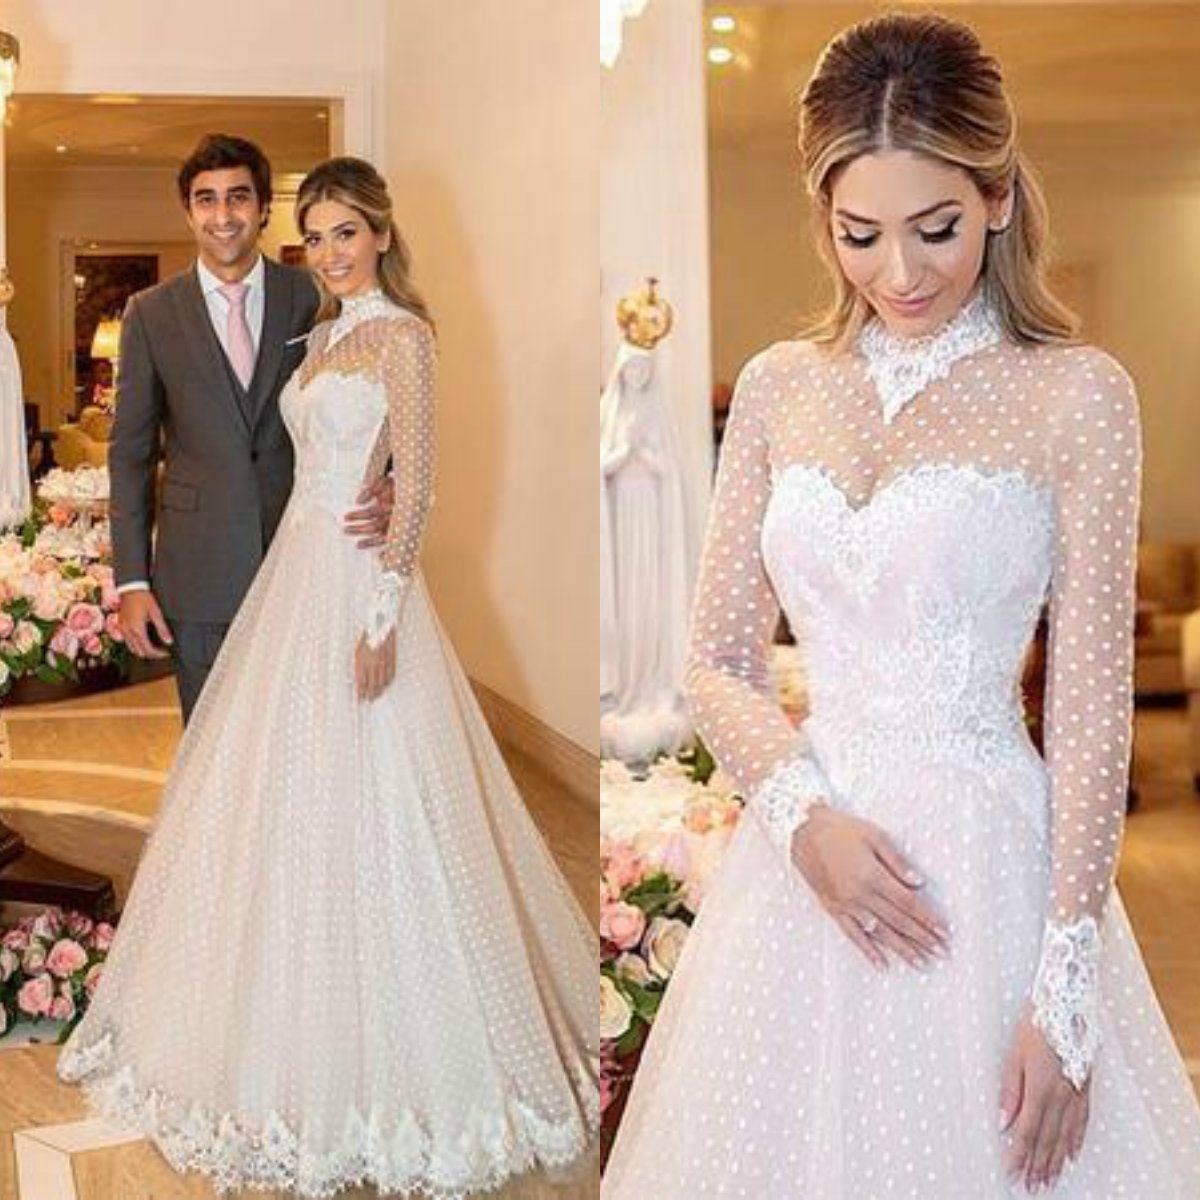 Discount 2019 Spring High Collar Wedding Dress Lace Long Sleeves Dot